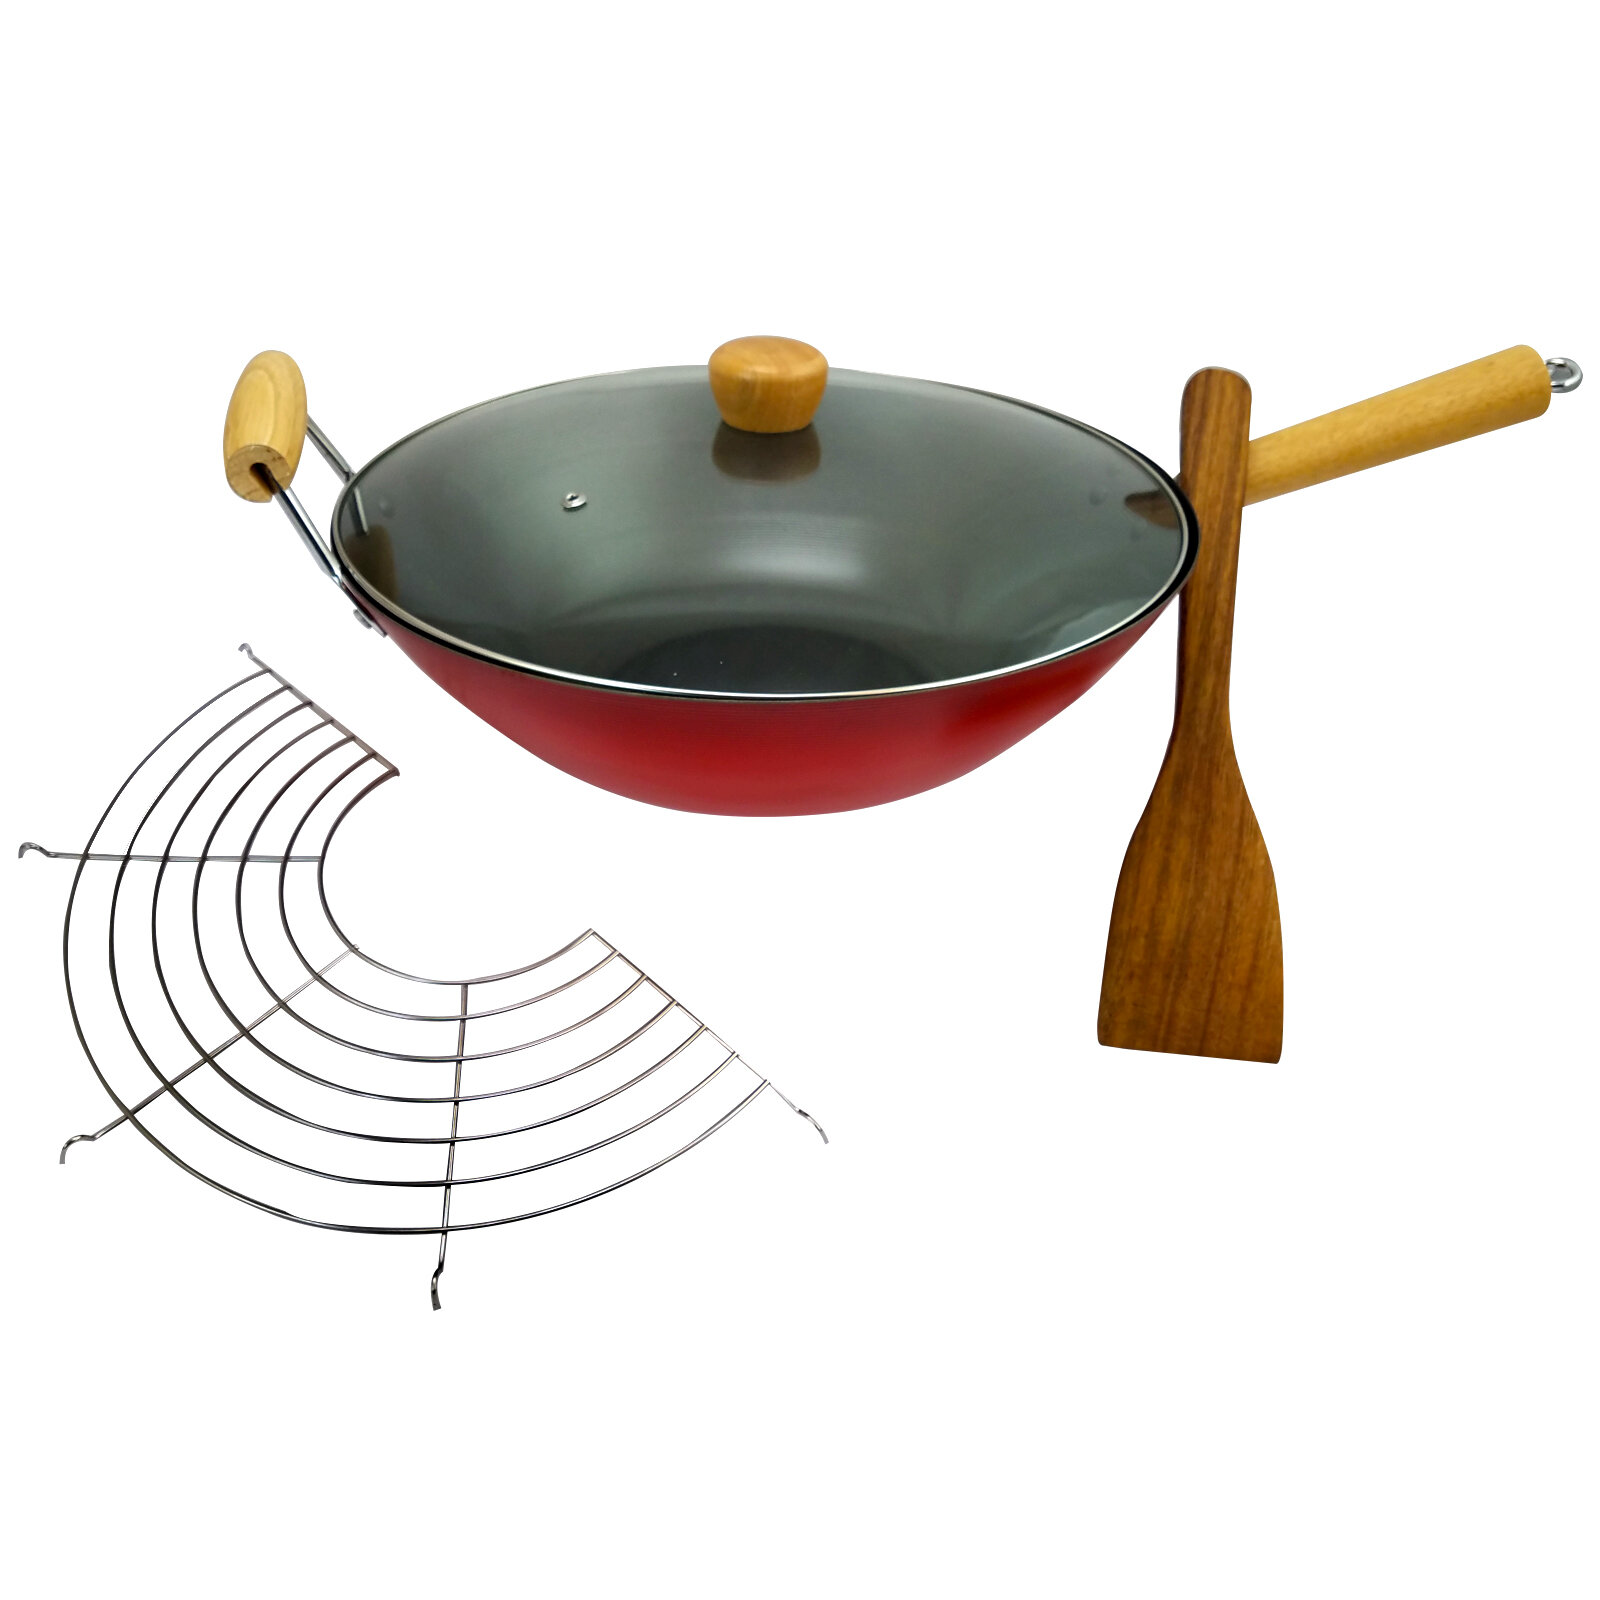 Cocina Carbon | Cocina 14 Gran Via Carbon Steel Wok Set With Lid Rack And Spatula